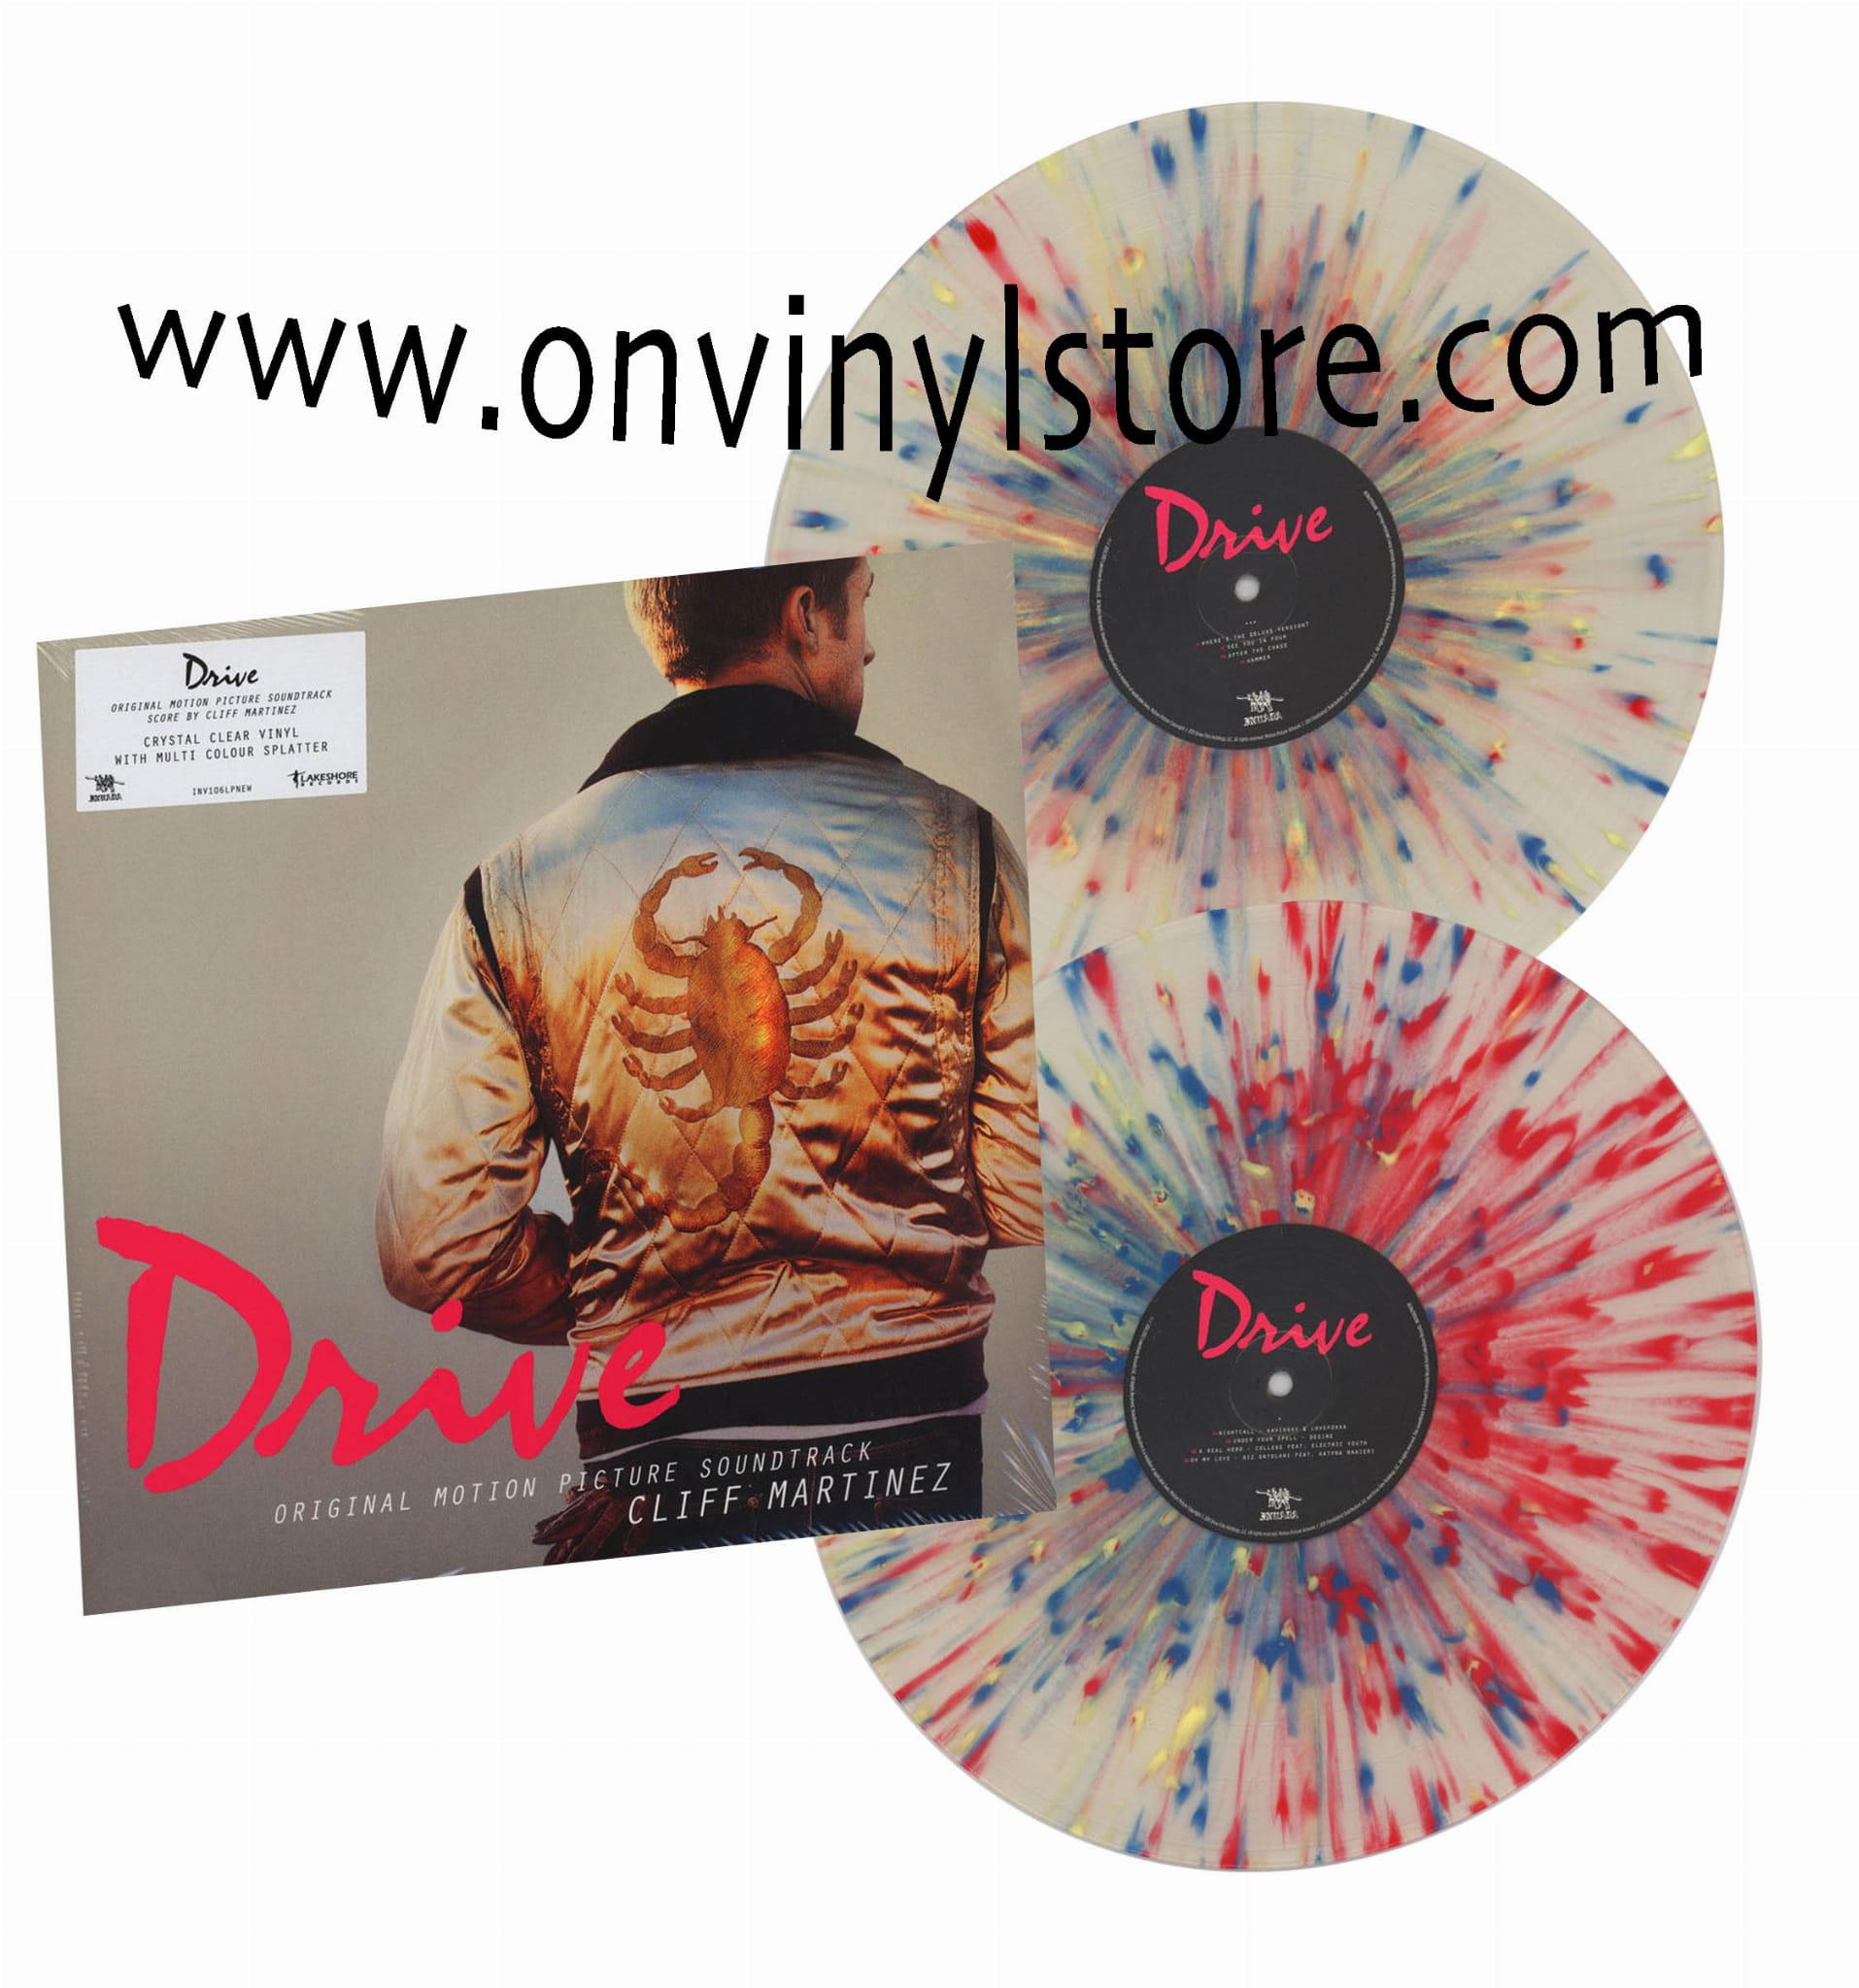 CLIFF MARTINEZ Drive 2xLP Crystal Clear with multi colour splatter vinyl